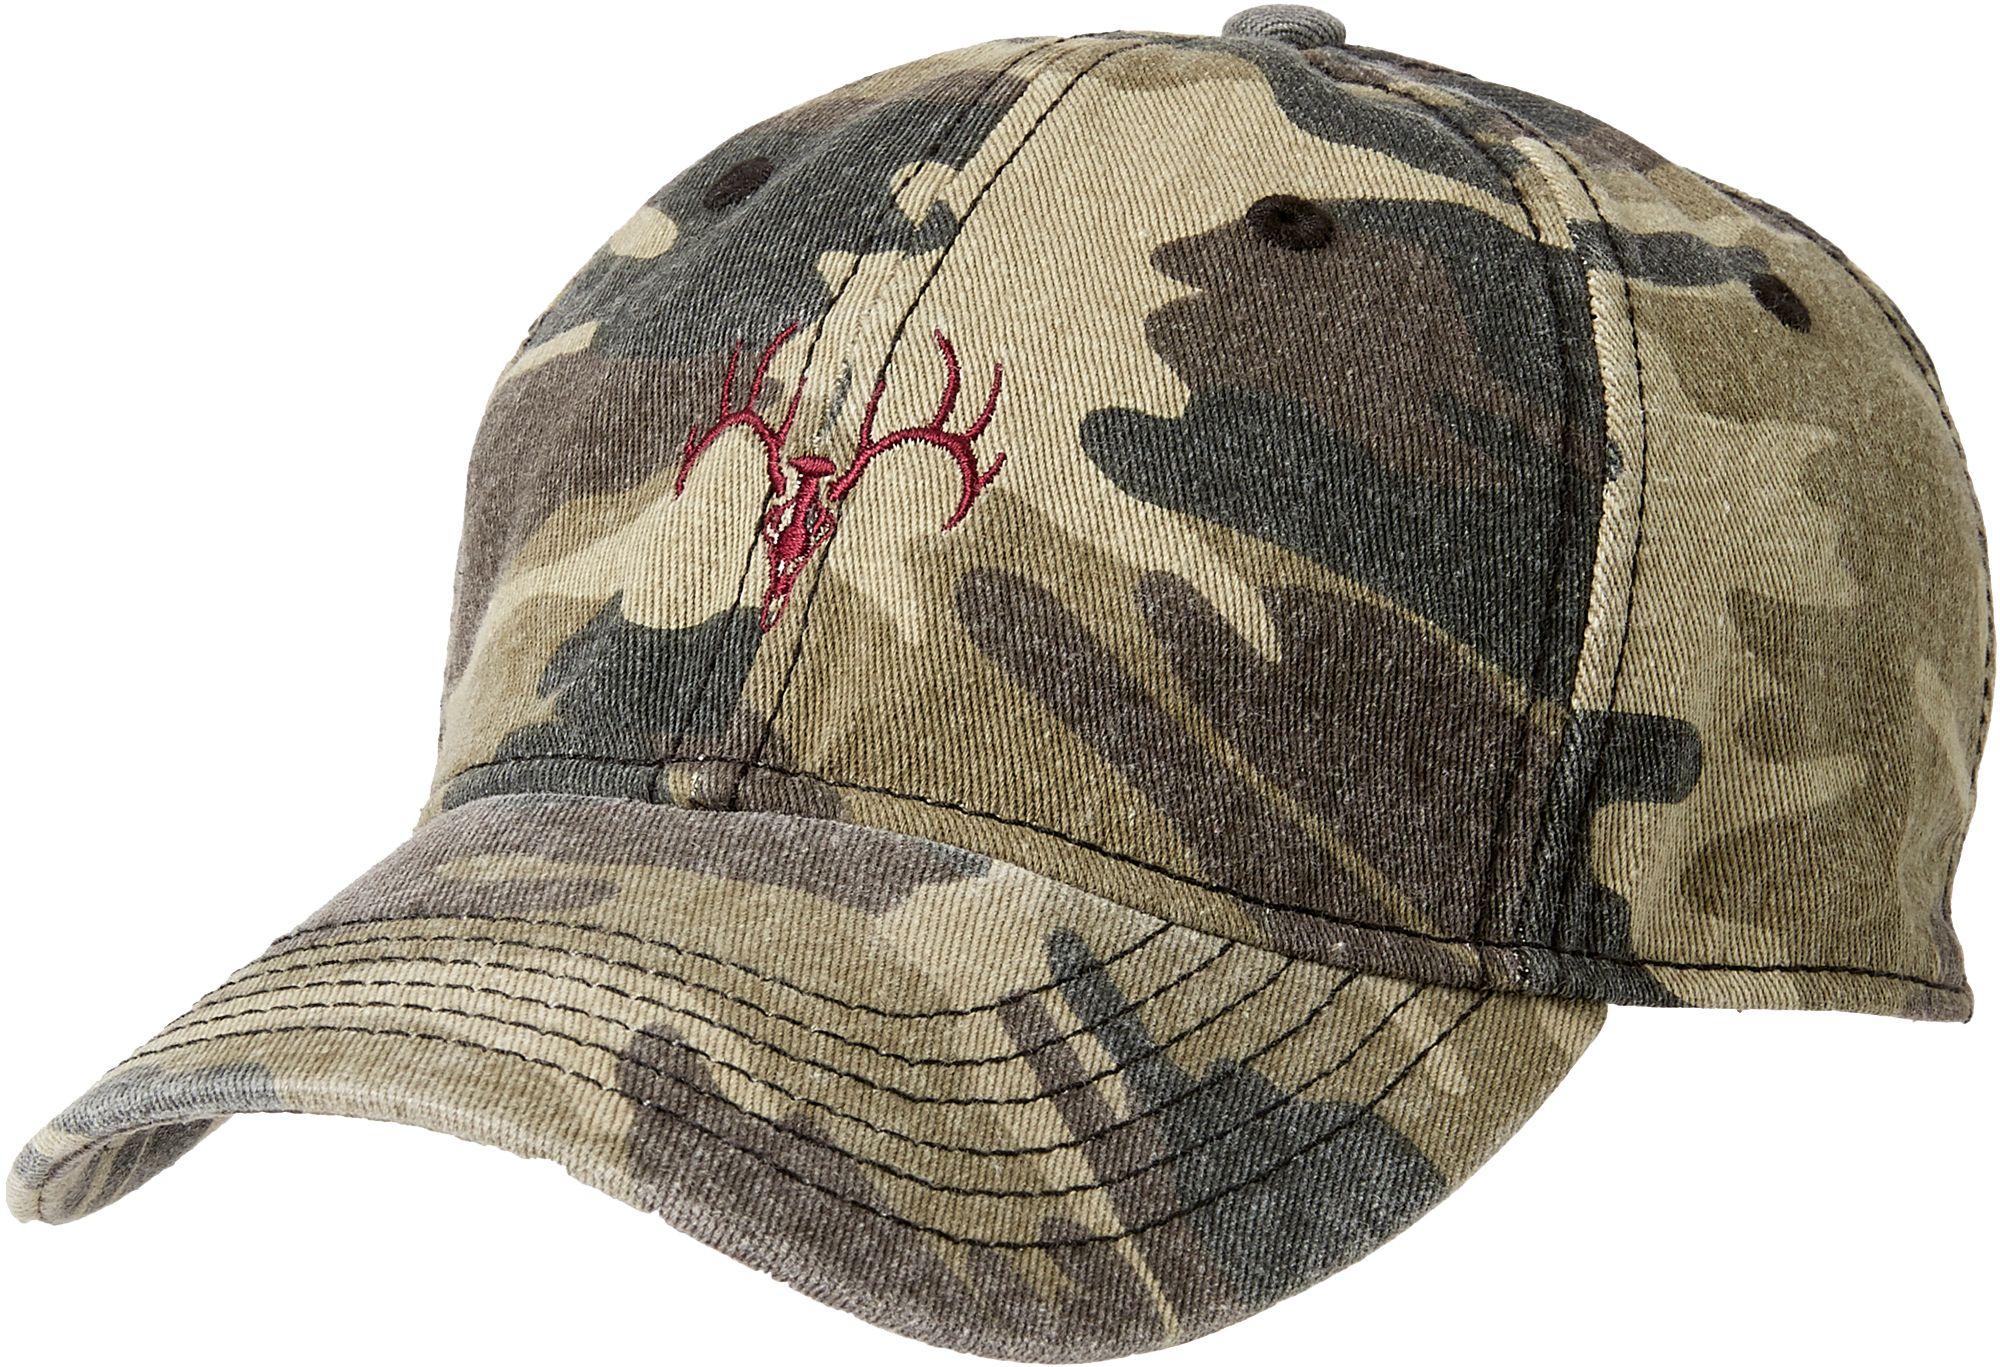 Field & Stream Women's Classic Wash Hat, Green thumbnail